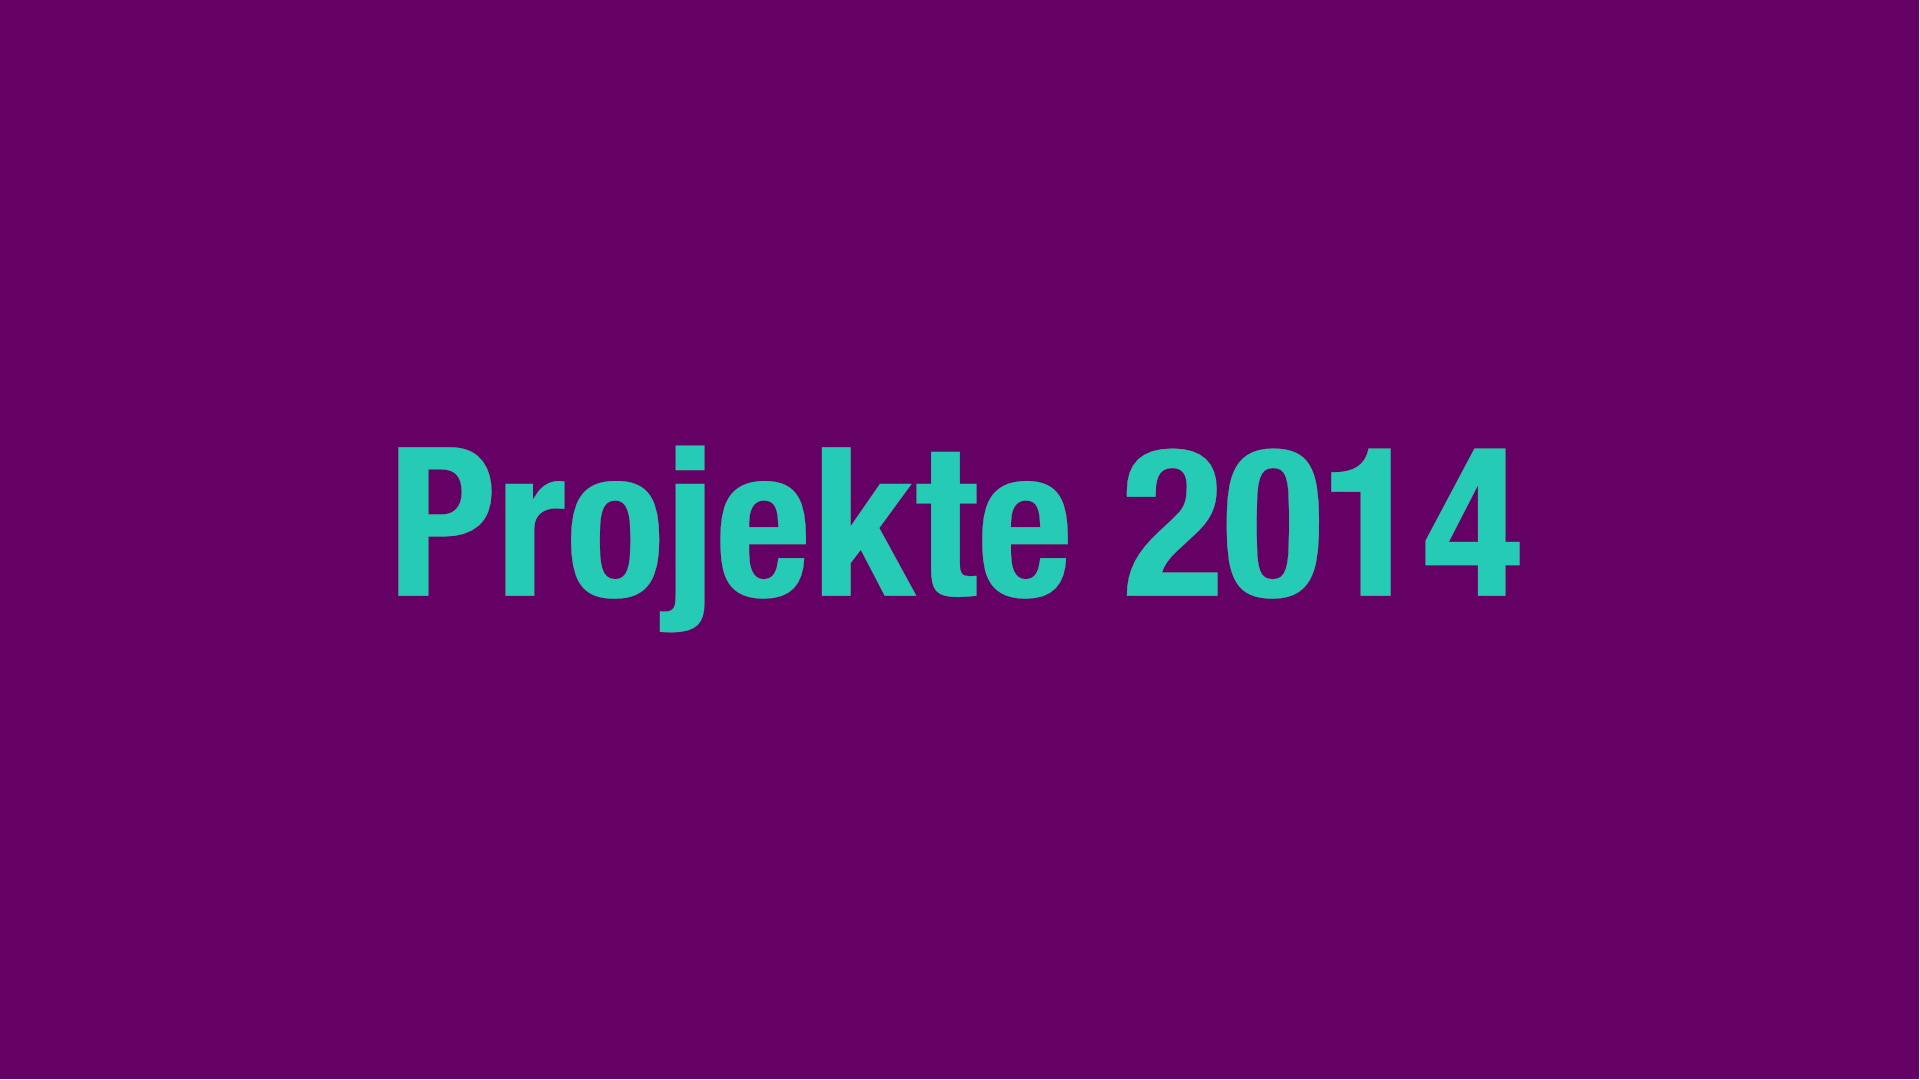 Projekte 2014